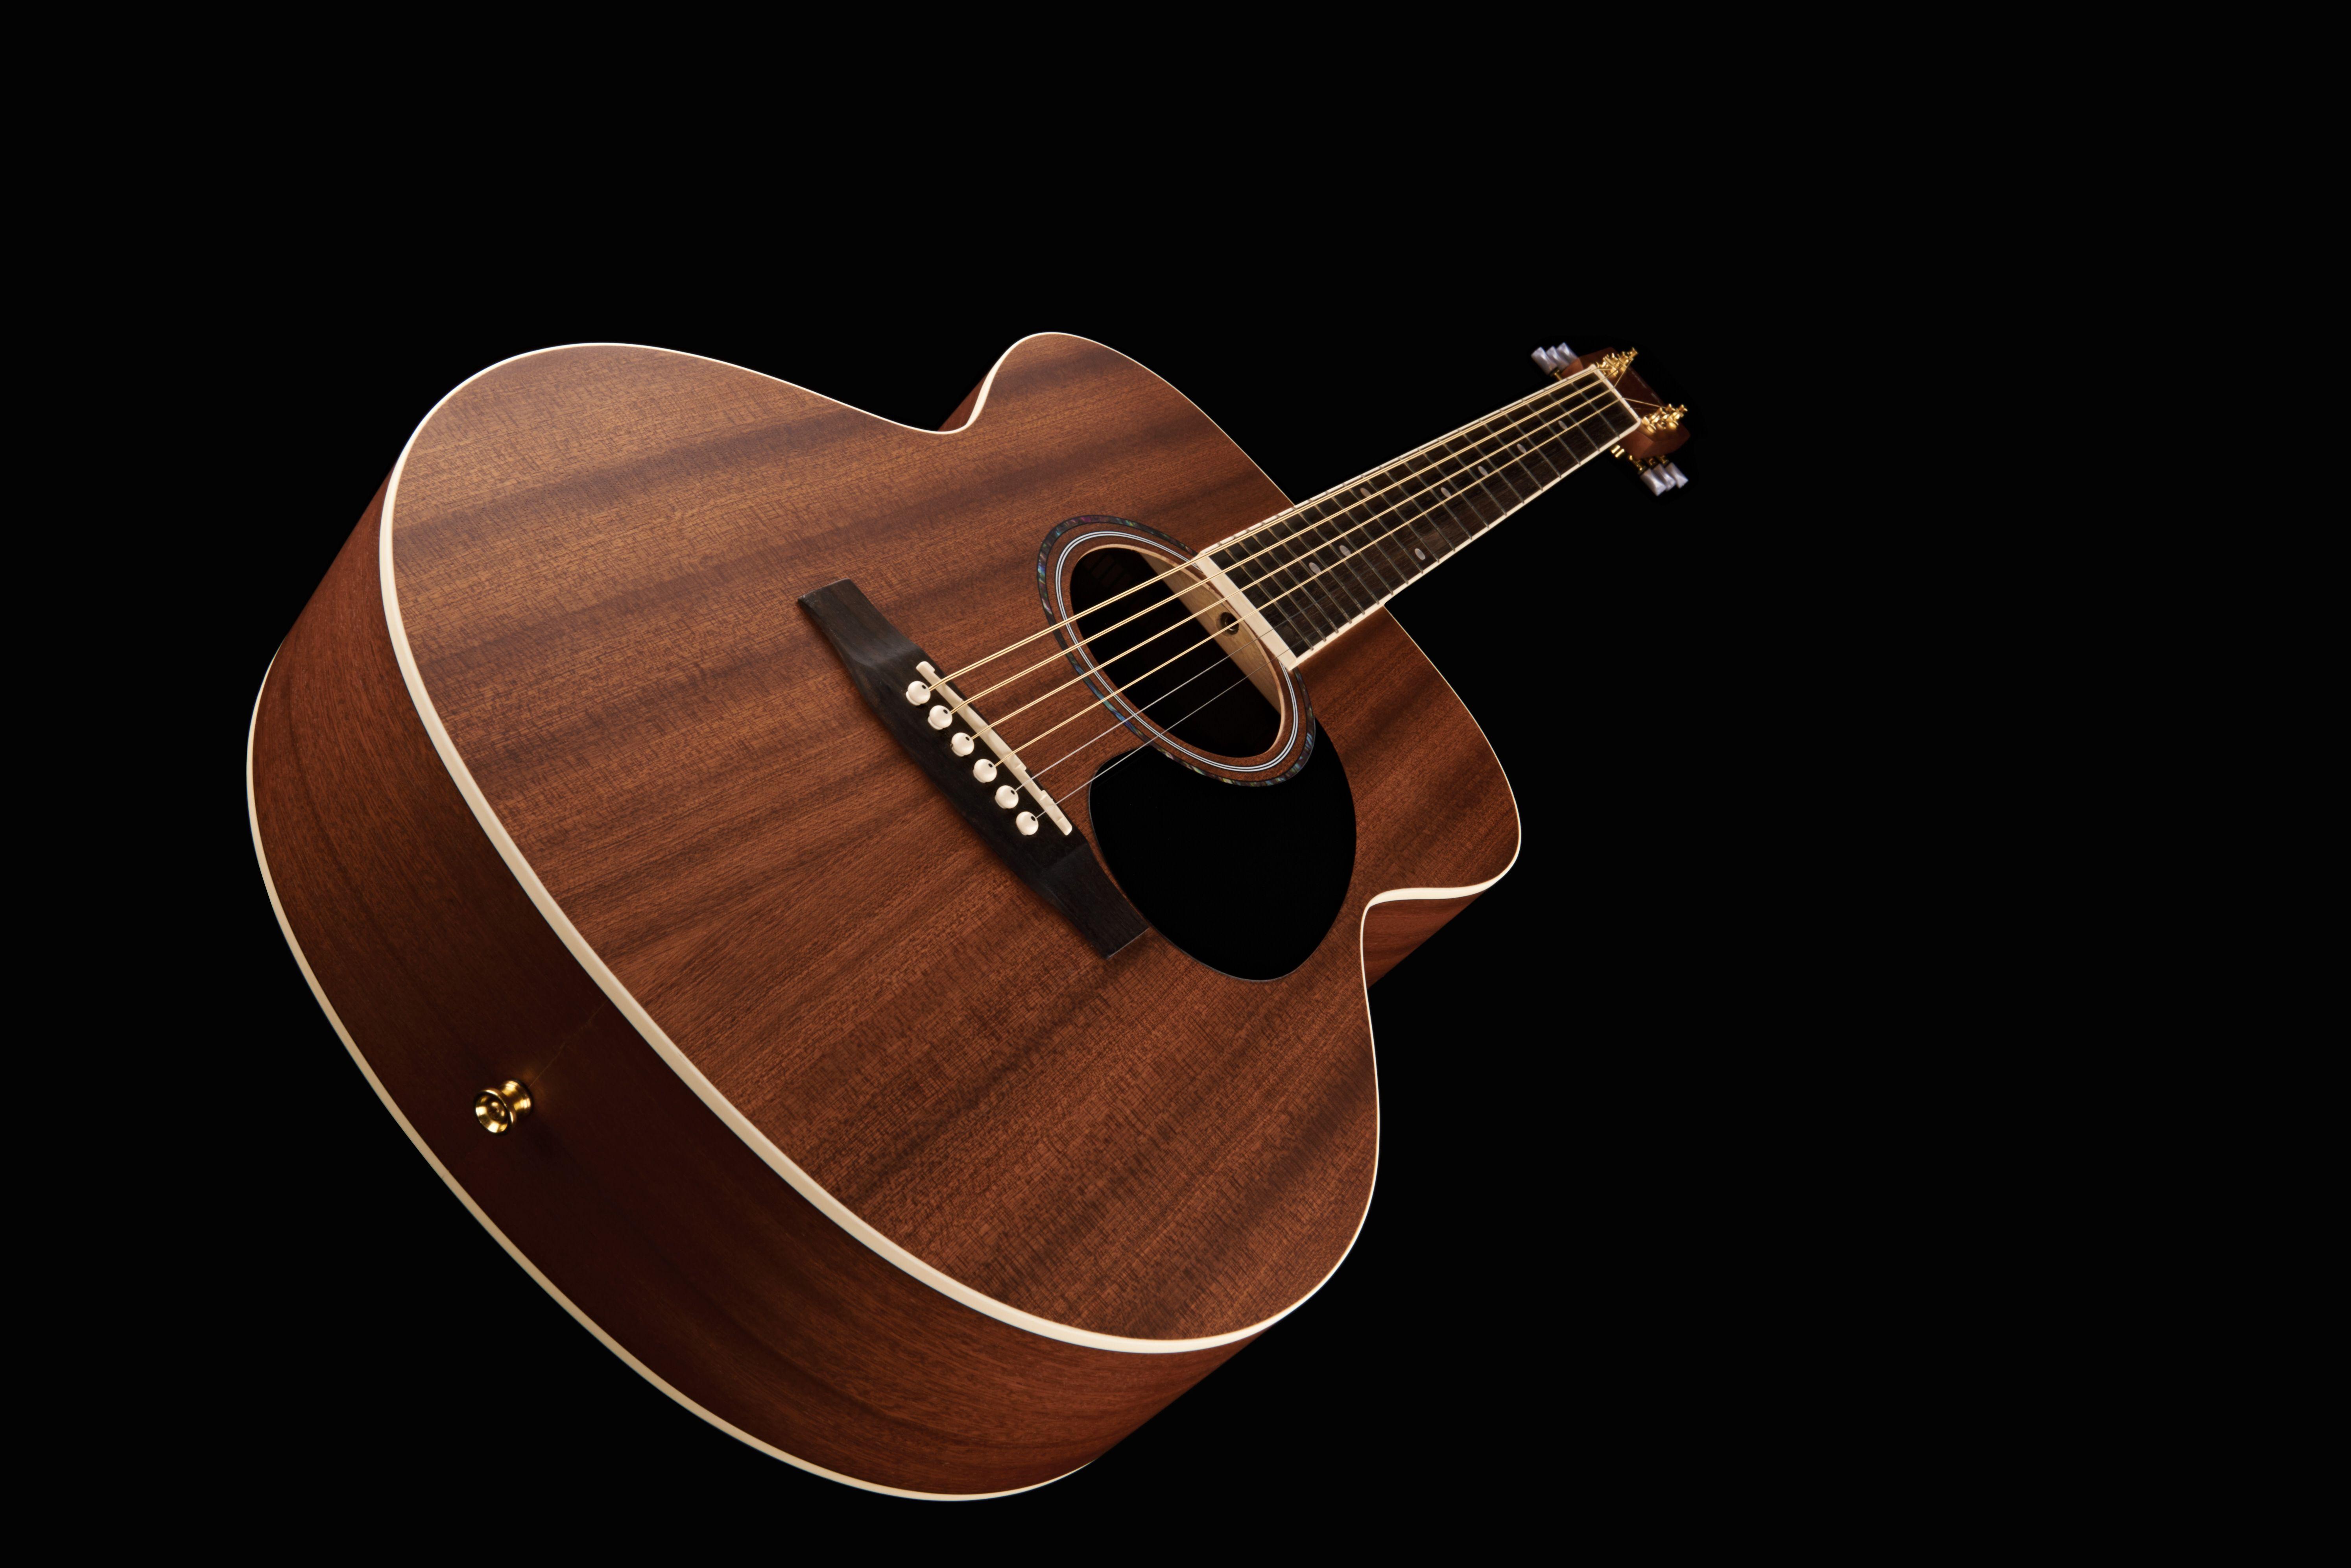 harley benton cg 45 ns in 2019 guitar acoustic guitar guitar accessories guitar. Black Bedroom Furniture Sets. Home Design Ideas